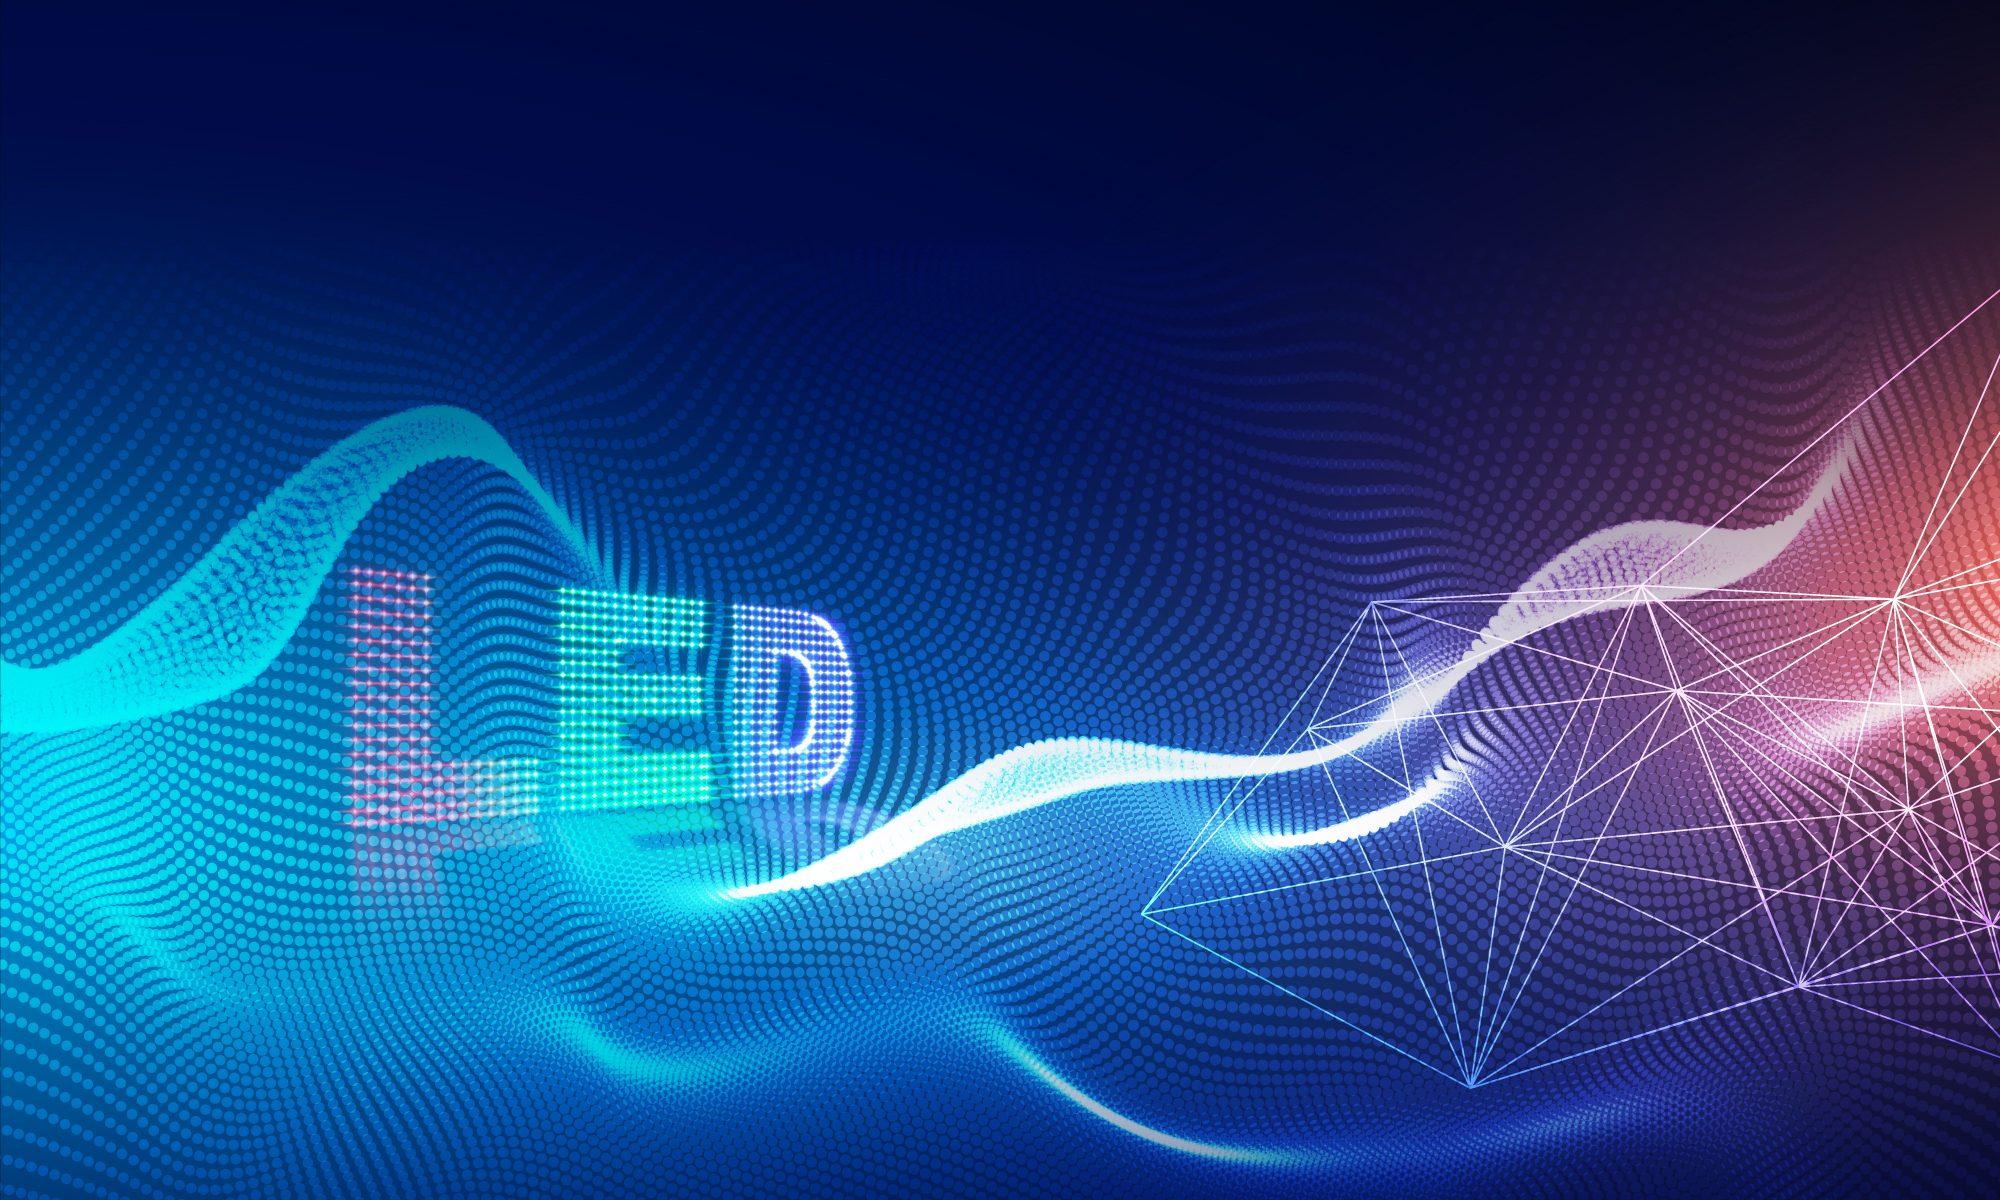 Lili-Tech LED